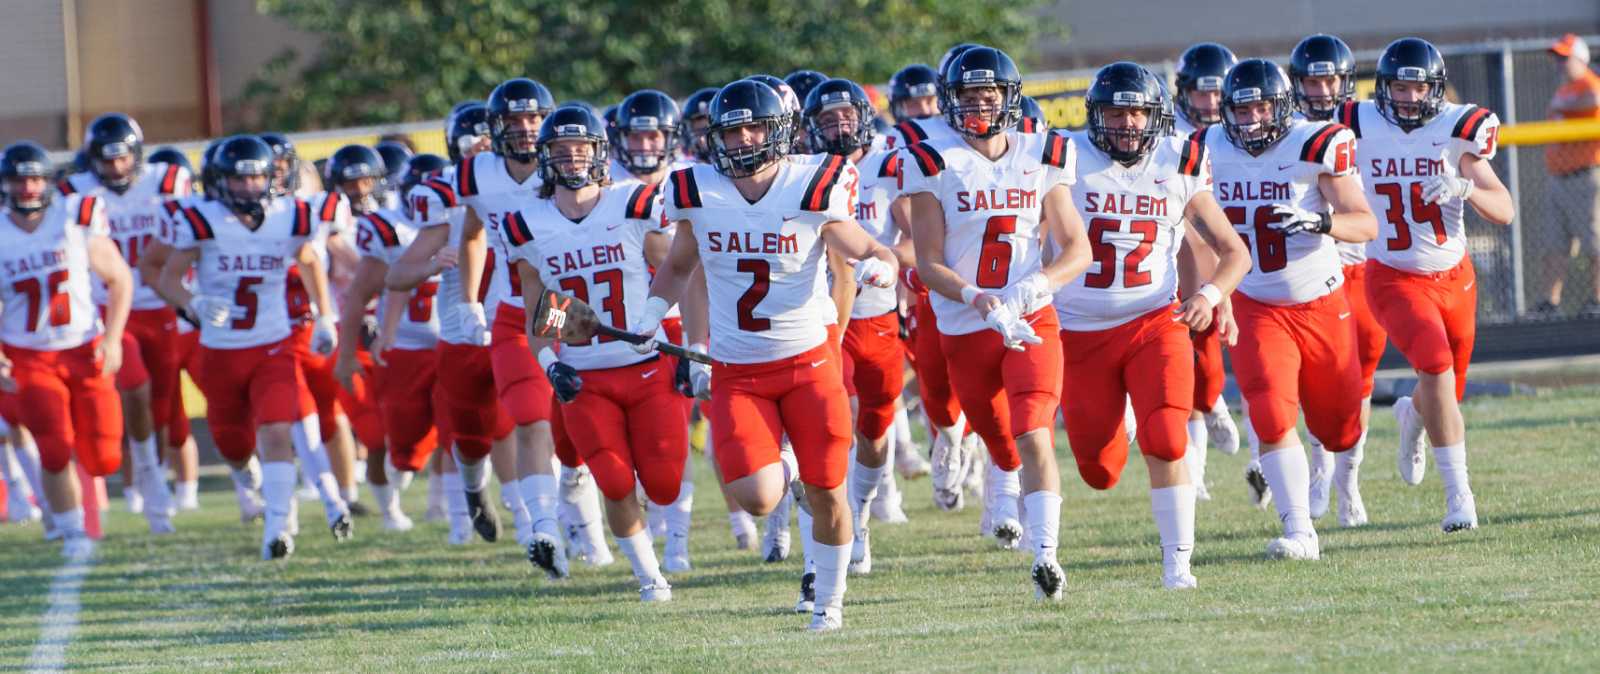 Salem - Team Home Salem Quakers Sports